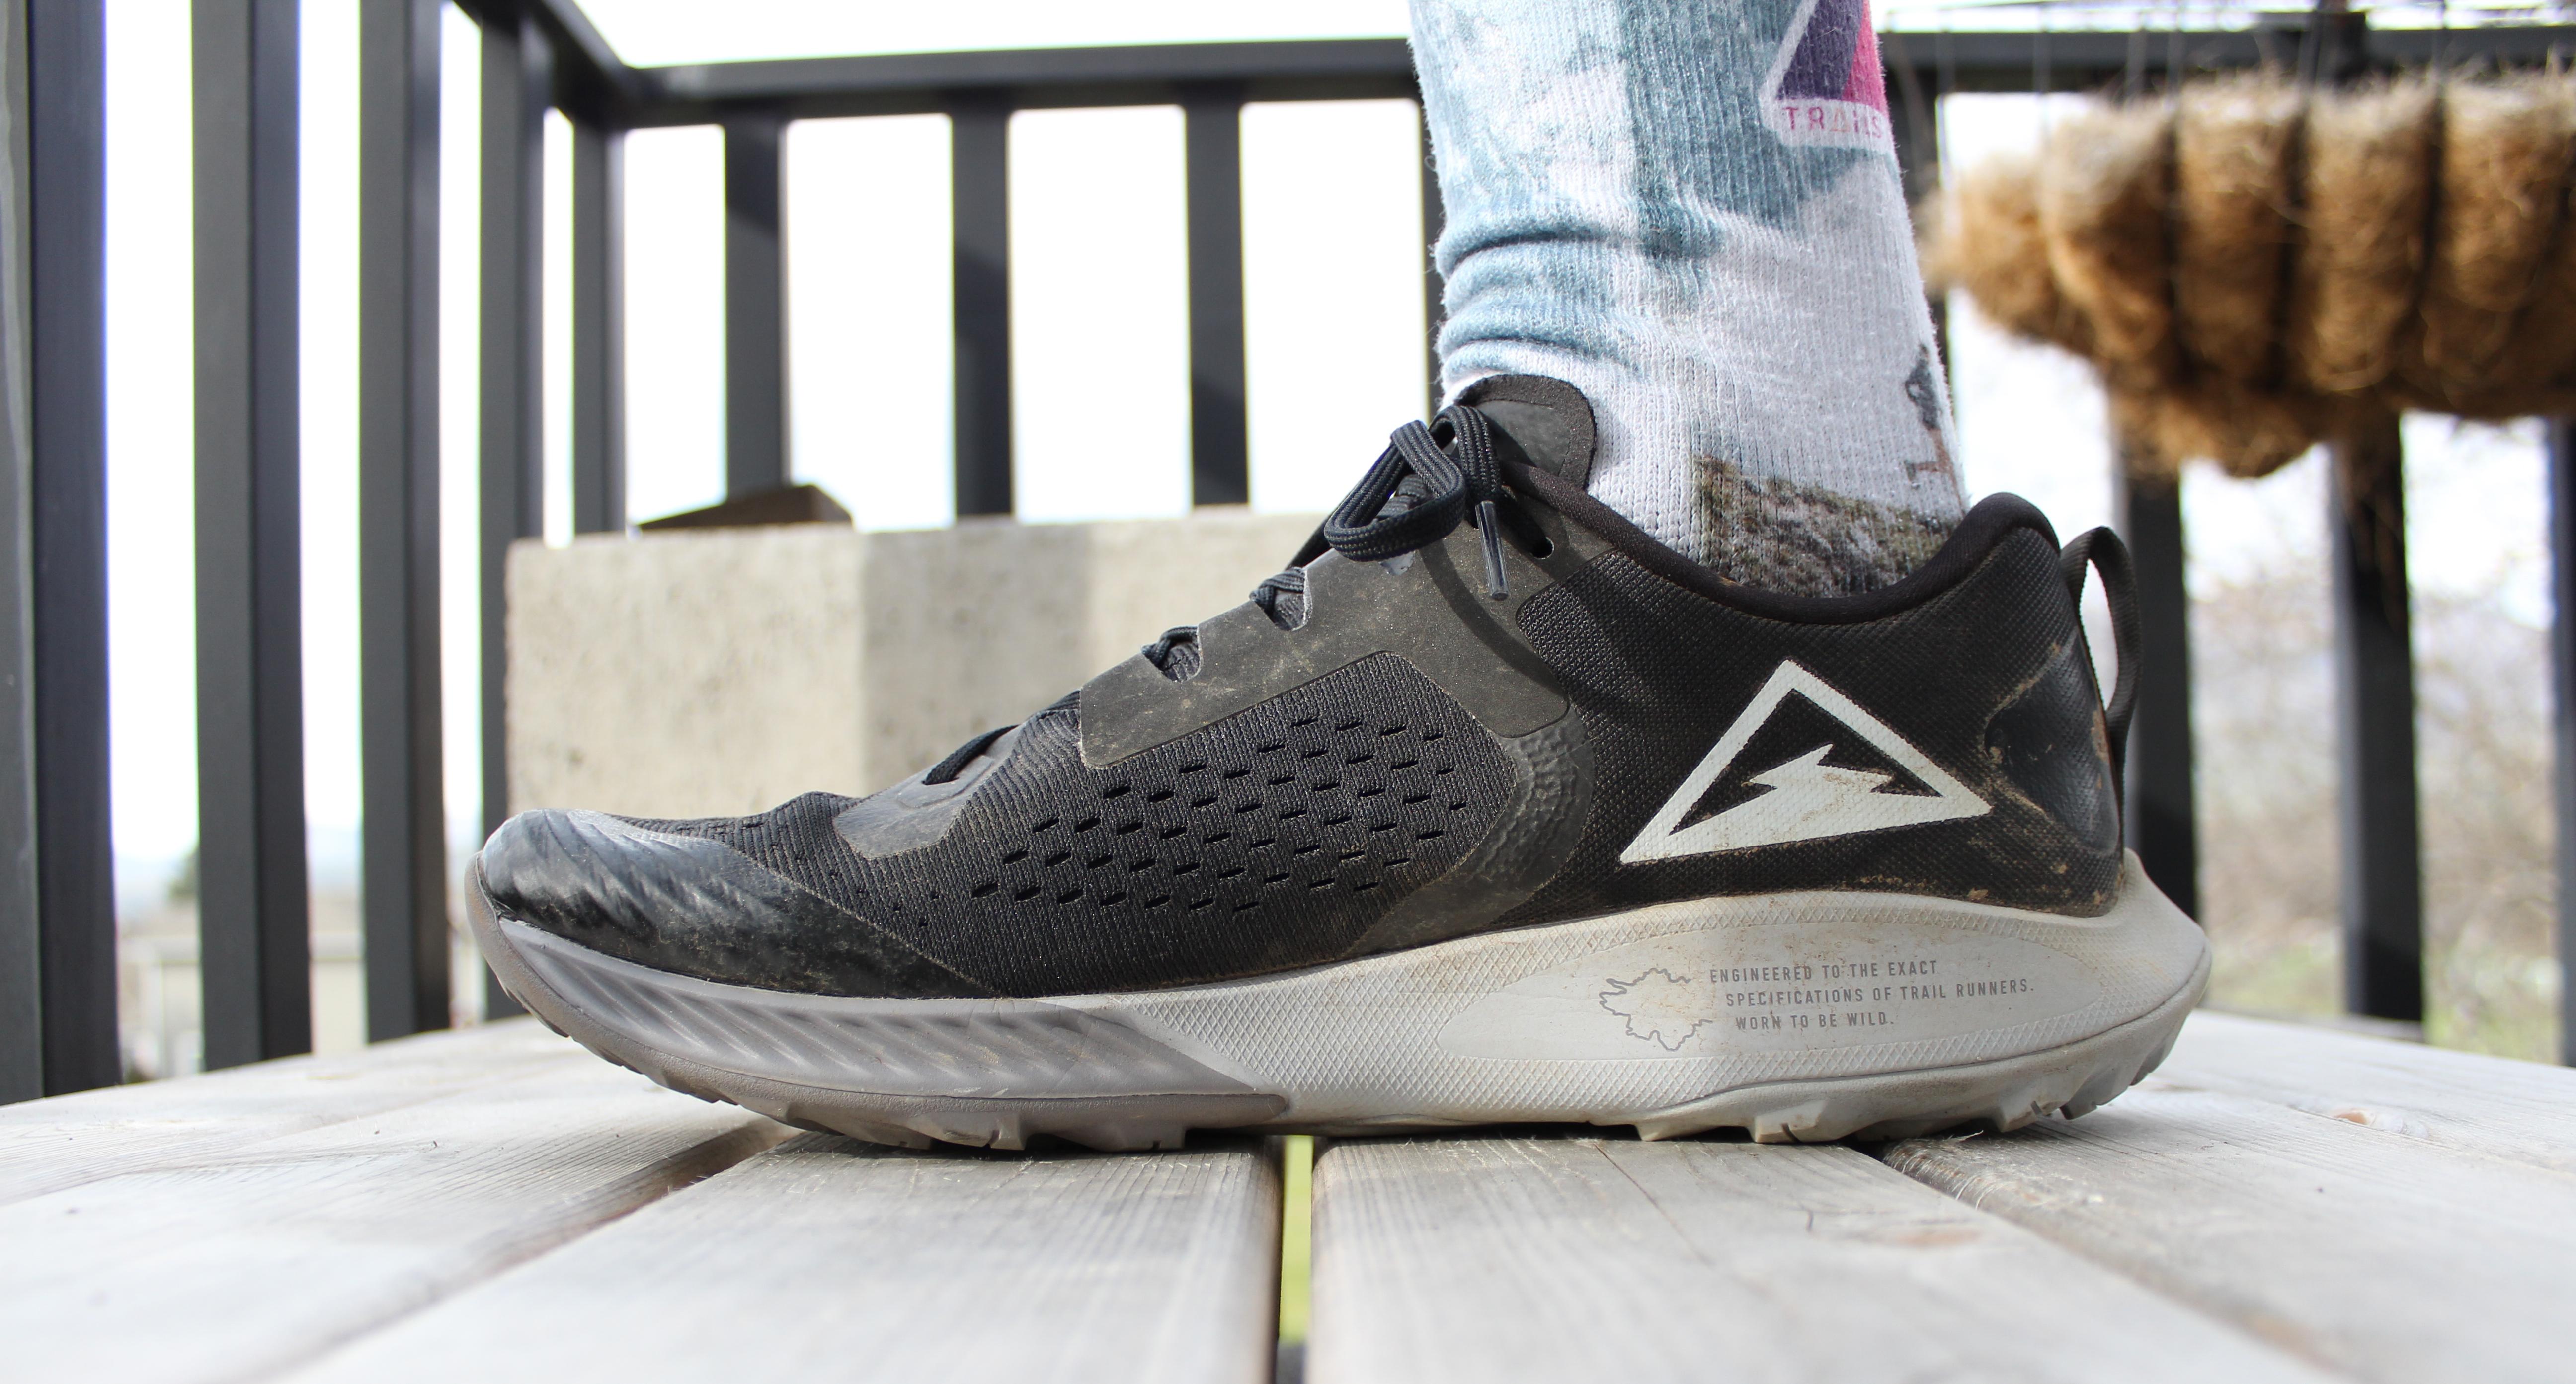 Nike Air Zoom Terra Kiger 5 Trail Shoe Review | Trails & Tarmac